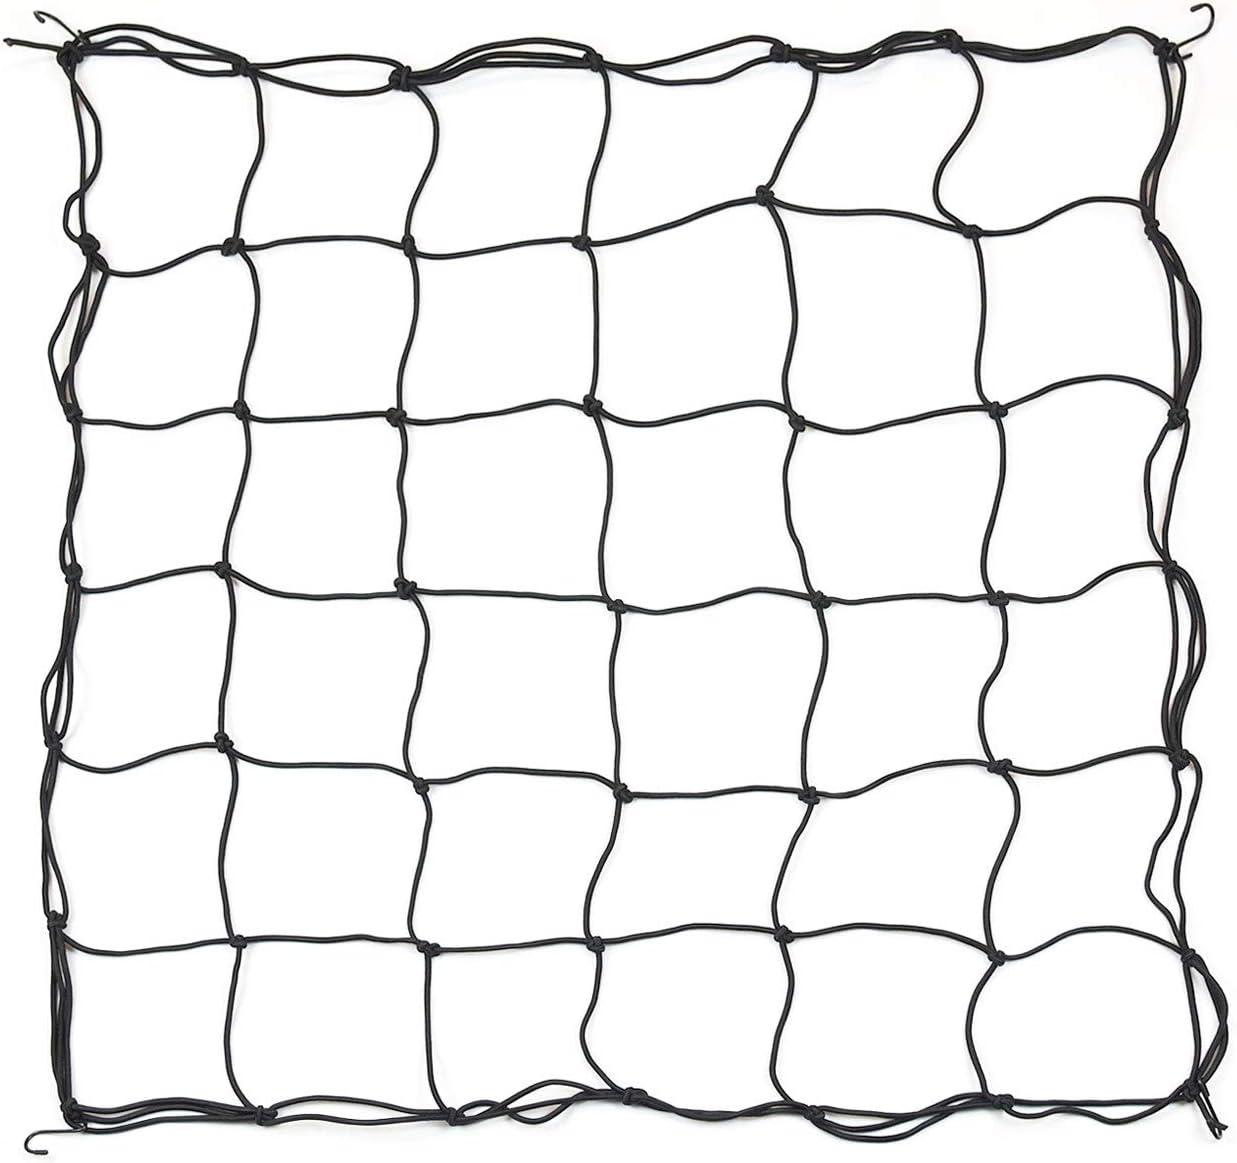 Elastic Grow Net, Trellis Netting for 4x4 5x5 4x2 Grow Tents Flexible net Trellis with 8 Metal Hooks and 36 Grow Grids